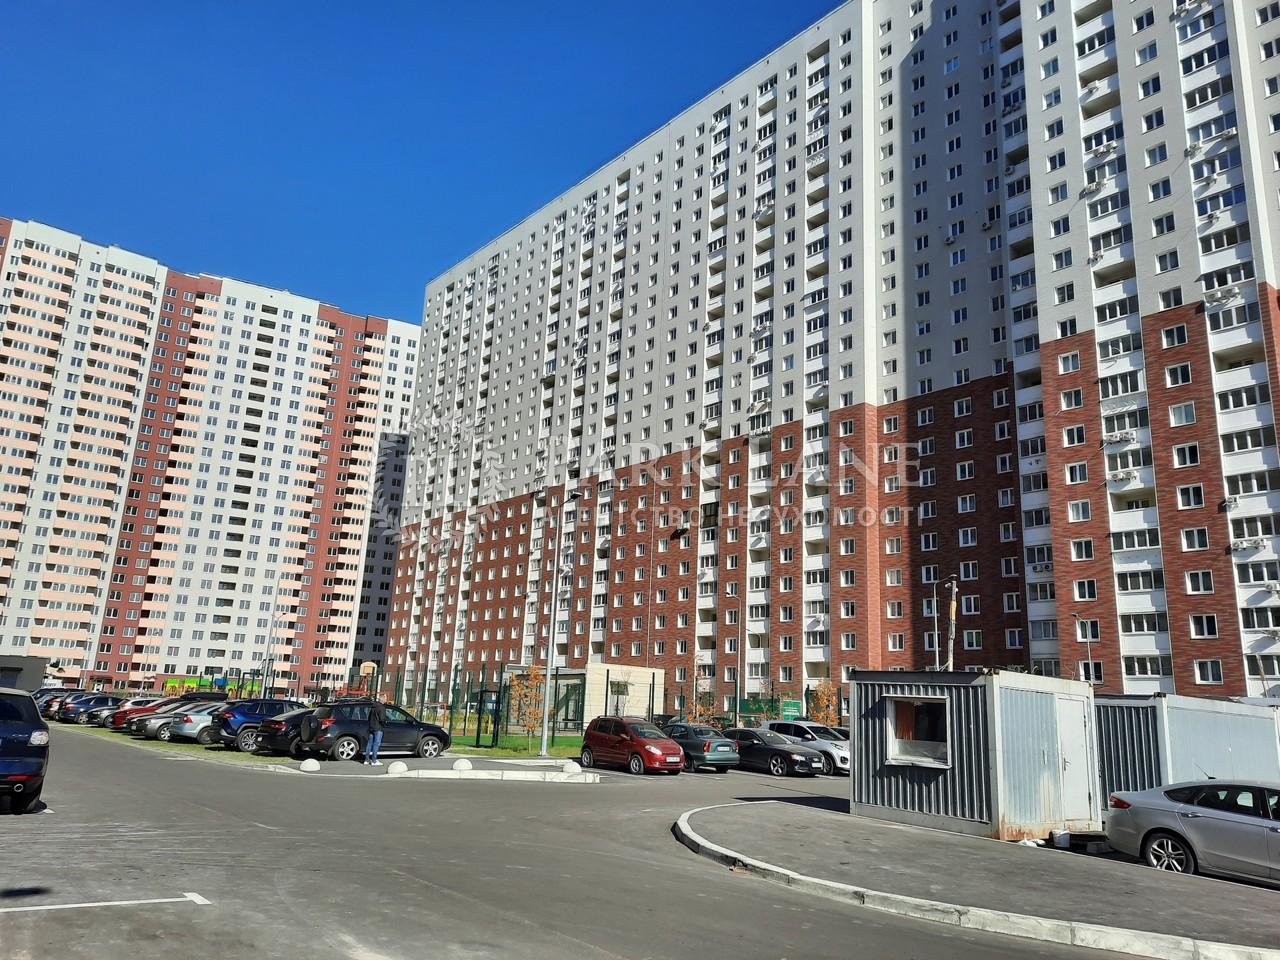 Квартира R-38231, Балтийский пер., 3, Киев - Фото 6